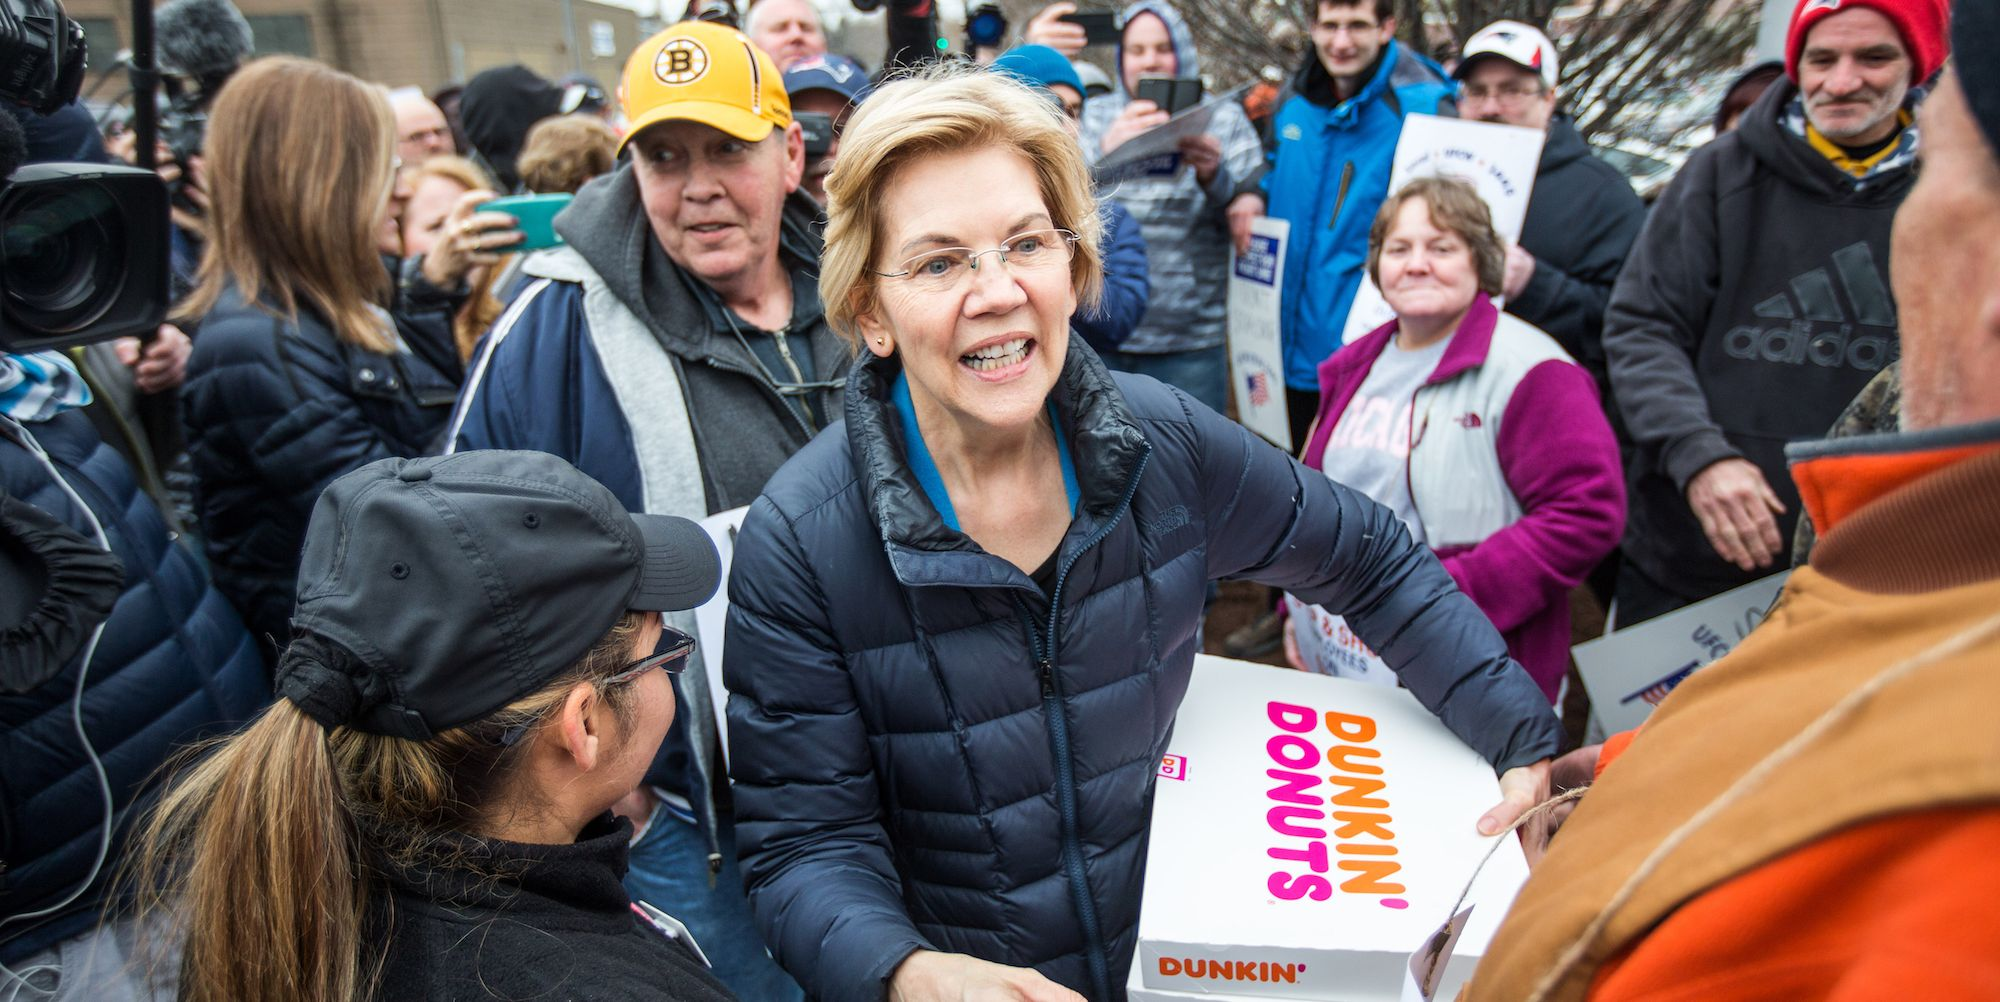 Democratic Presidential Candidate Elizabeth Warren Joins Picket Line With Striking Stop & Shop Workers In Somerville, Massachusetts